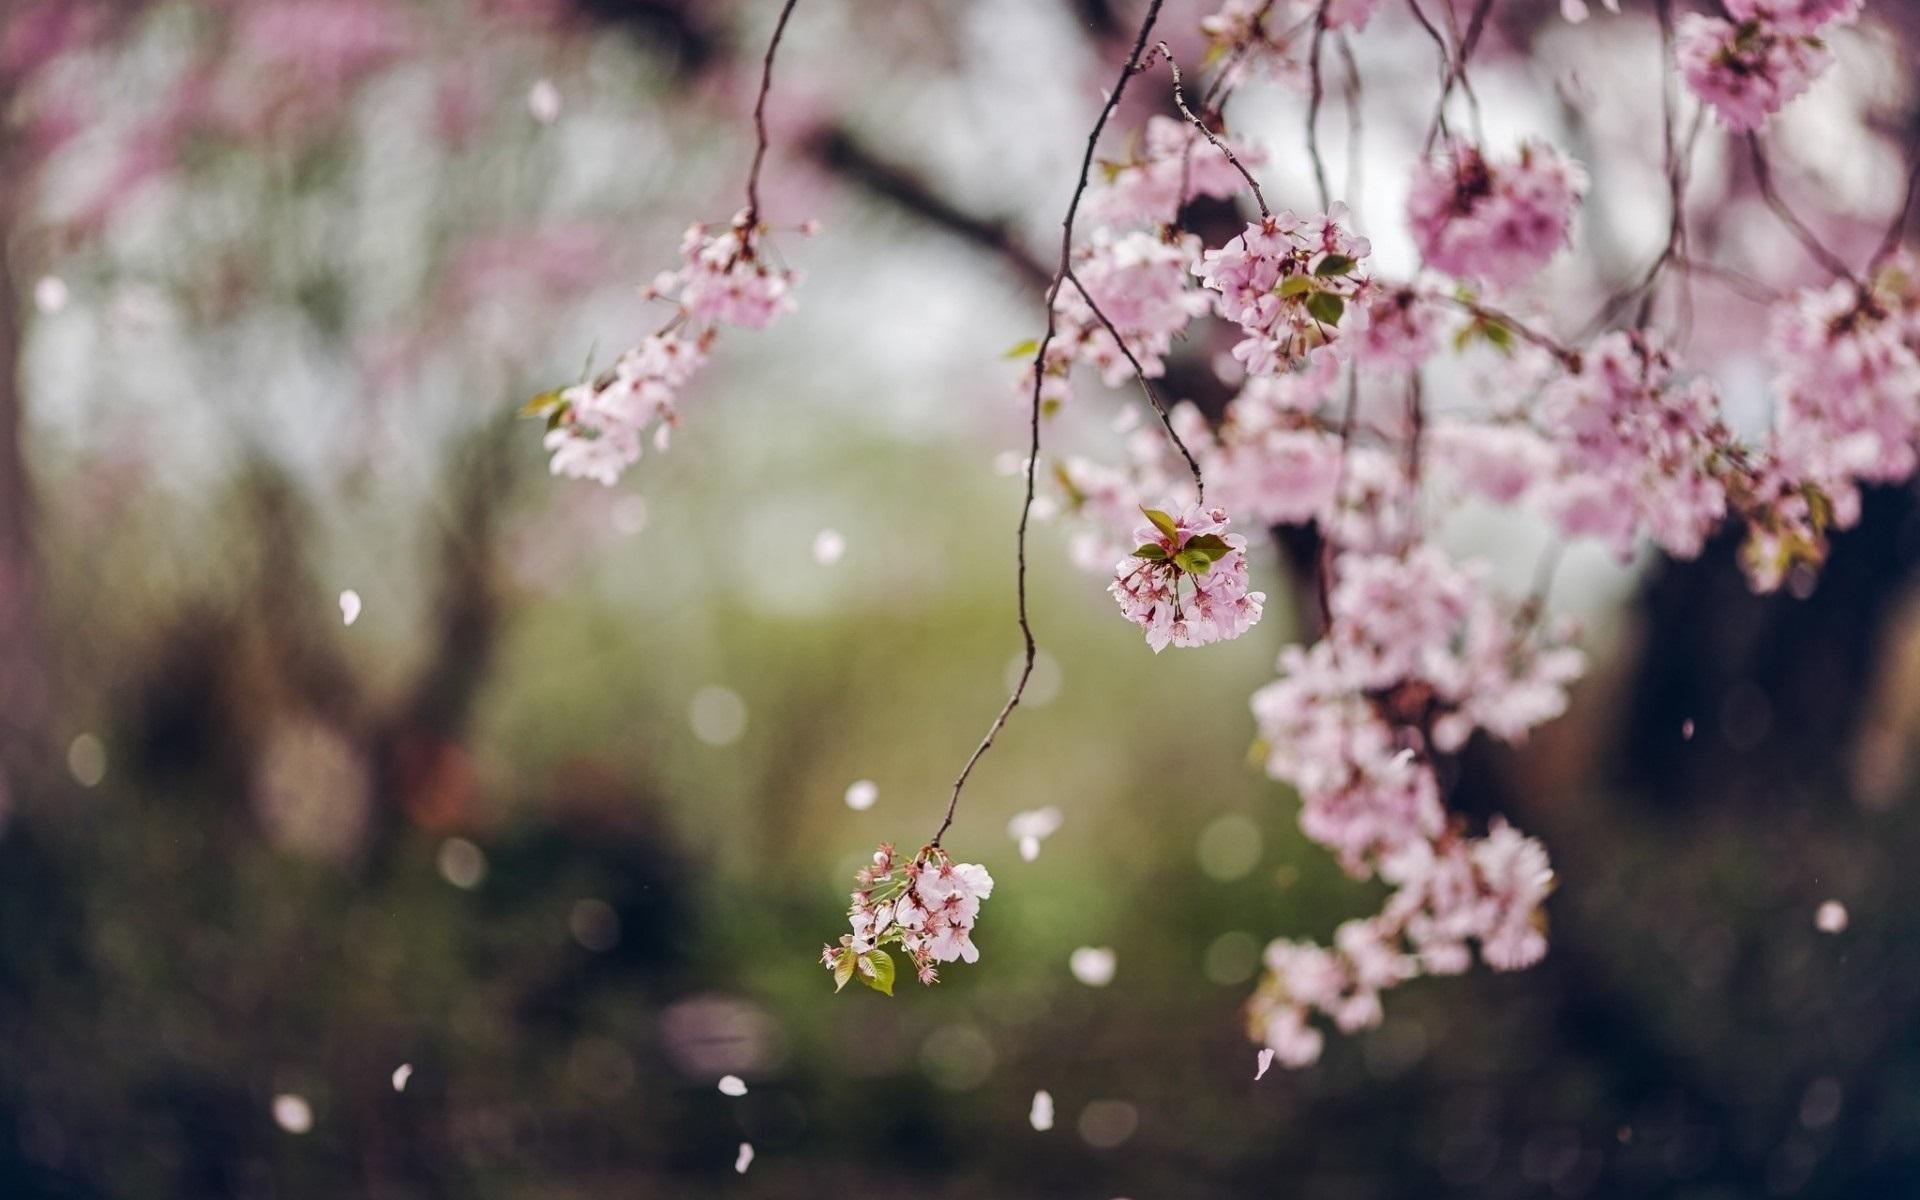 Beautiful Colorful Girls Anime Sakura Wallpaper Trees Cherry Flowers Blossom Spring Petals Wallpaper